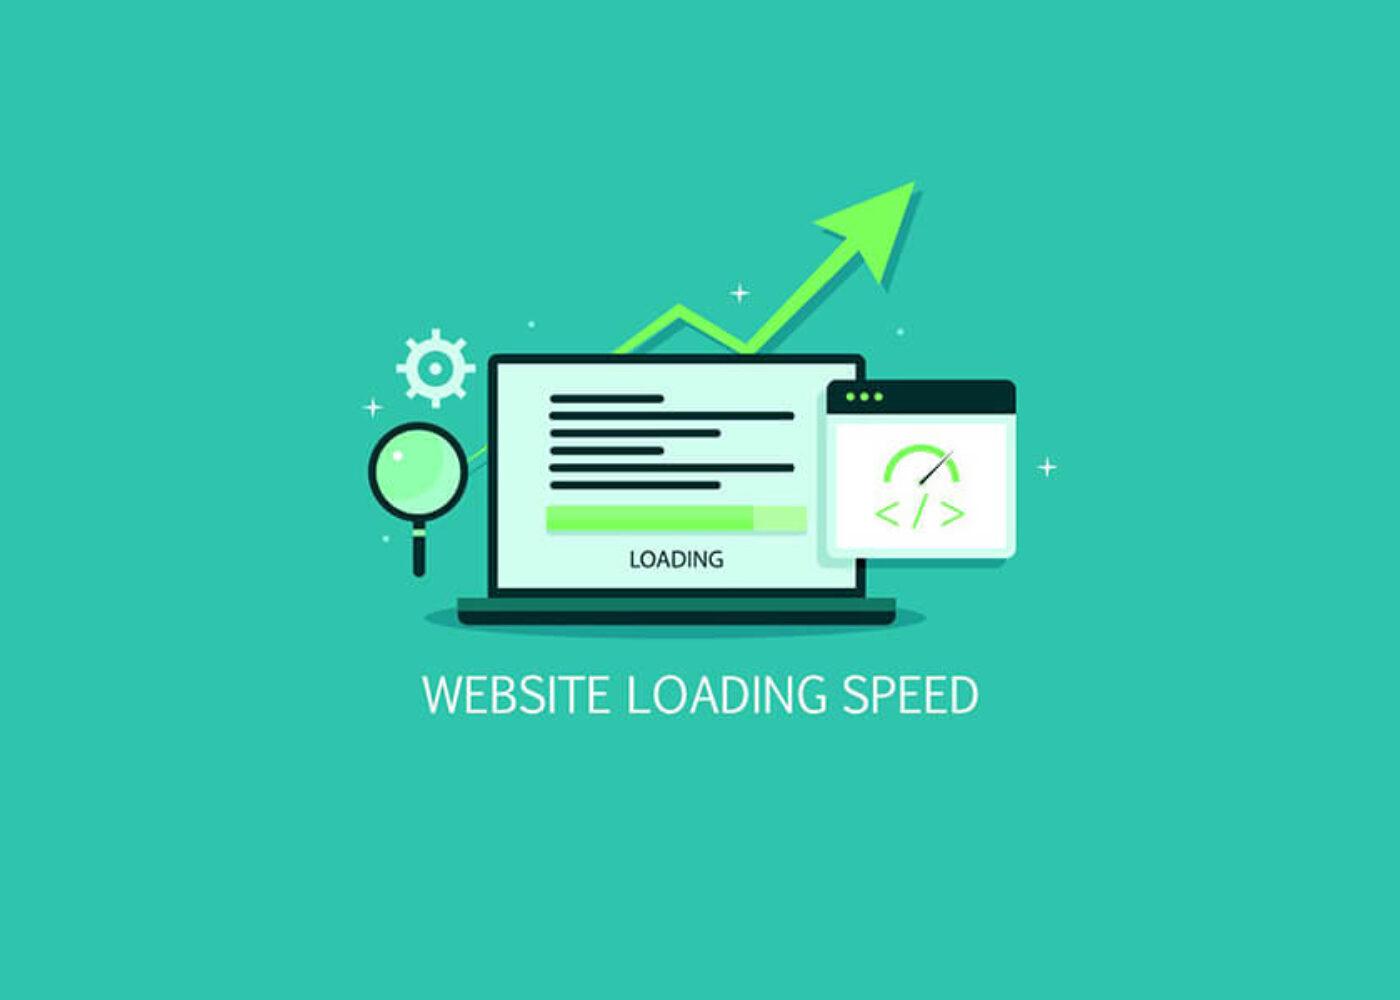 Focus on website speed